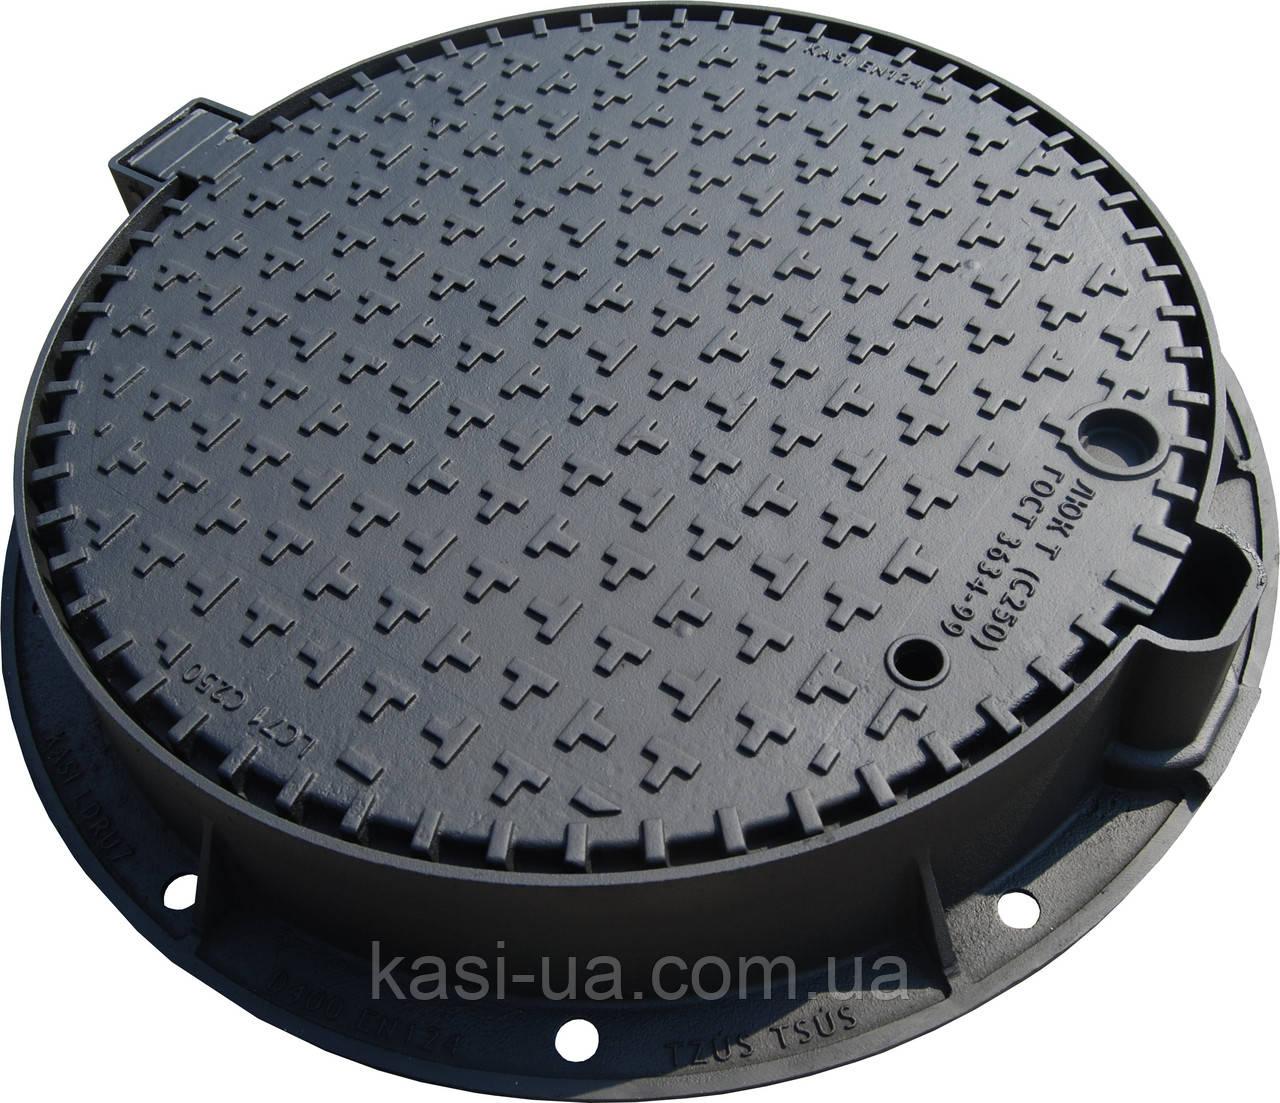 Люк чугунный канализационный тяжелый KASI тип Т (С250) KСU71P (Чехия)